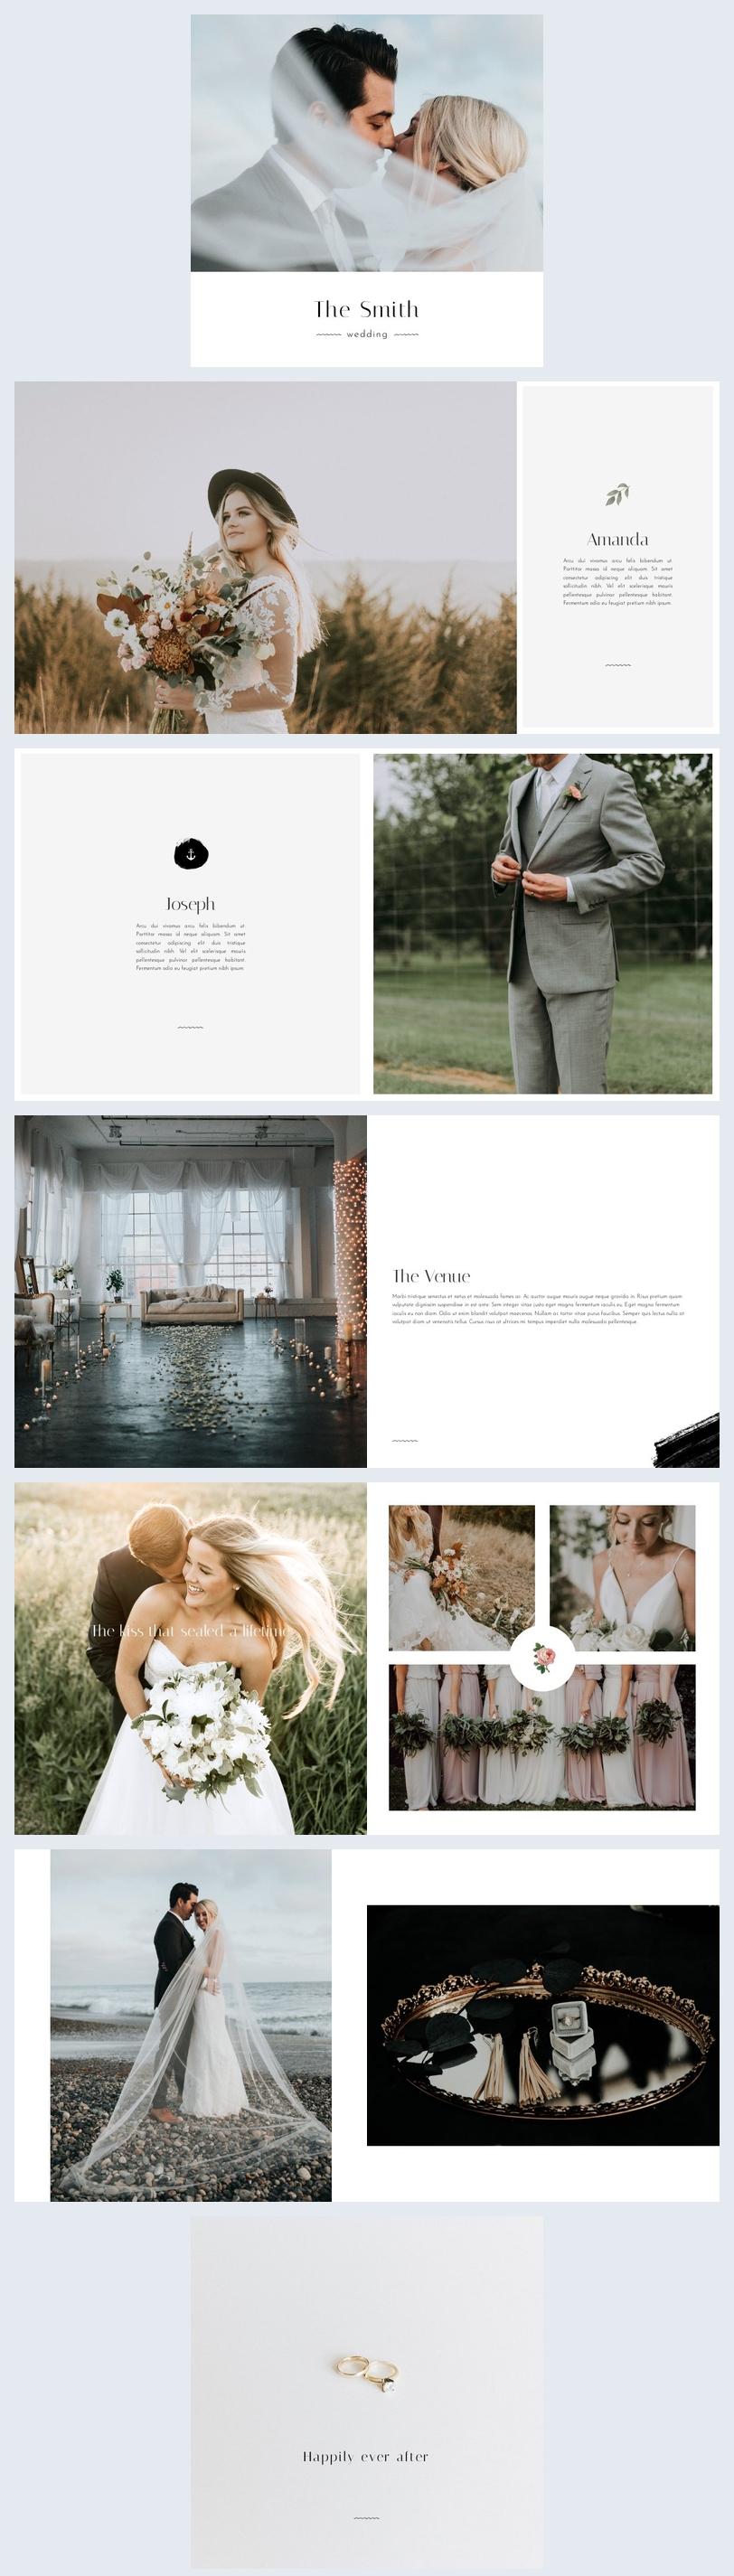 Album de mariage en ligne